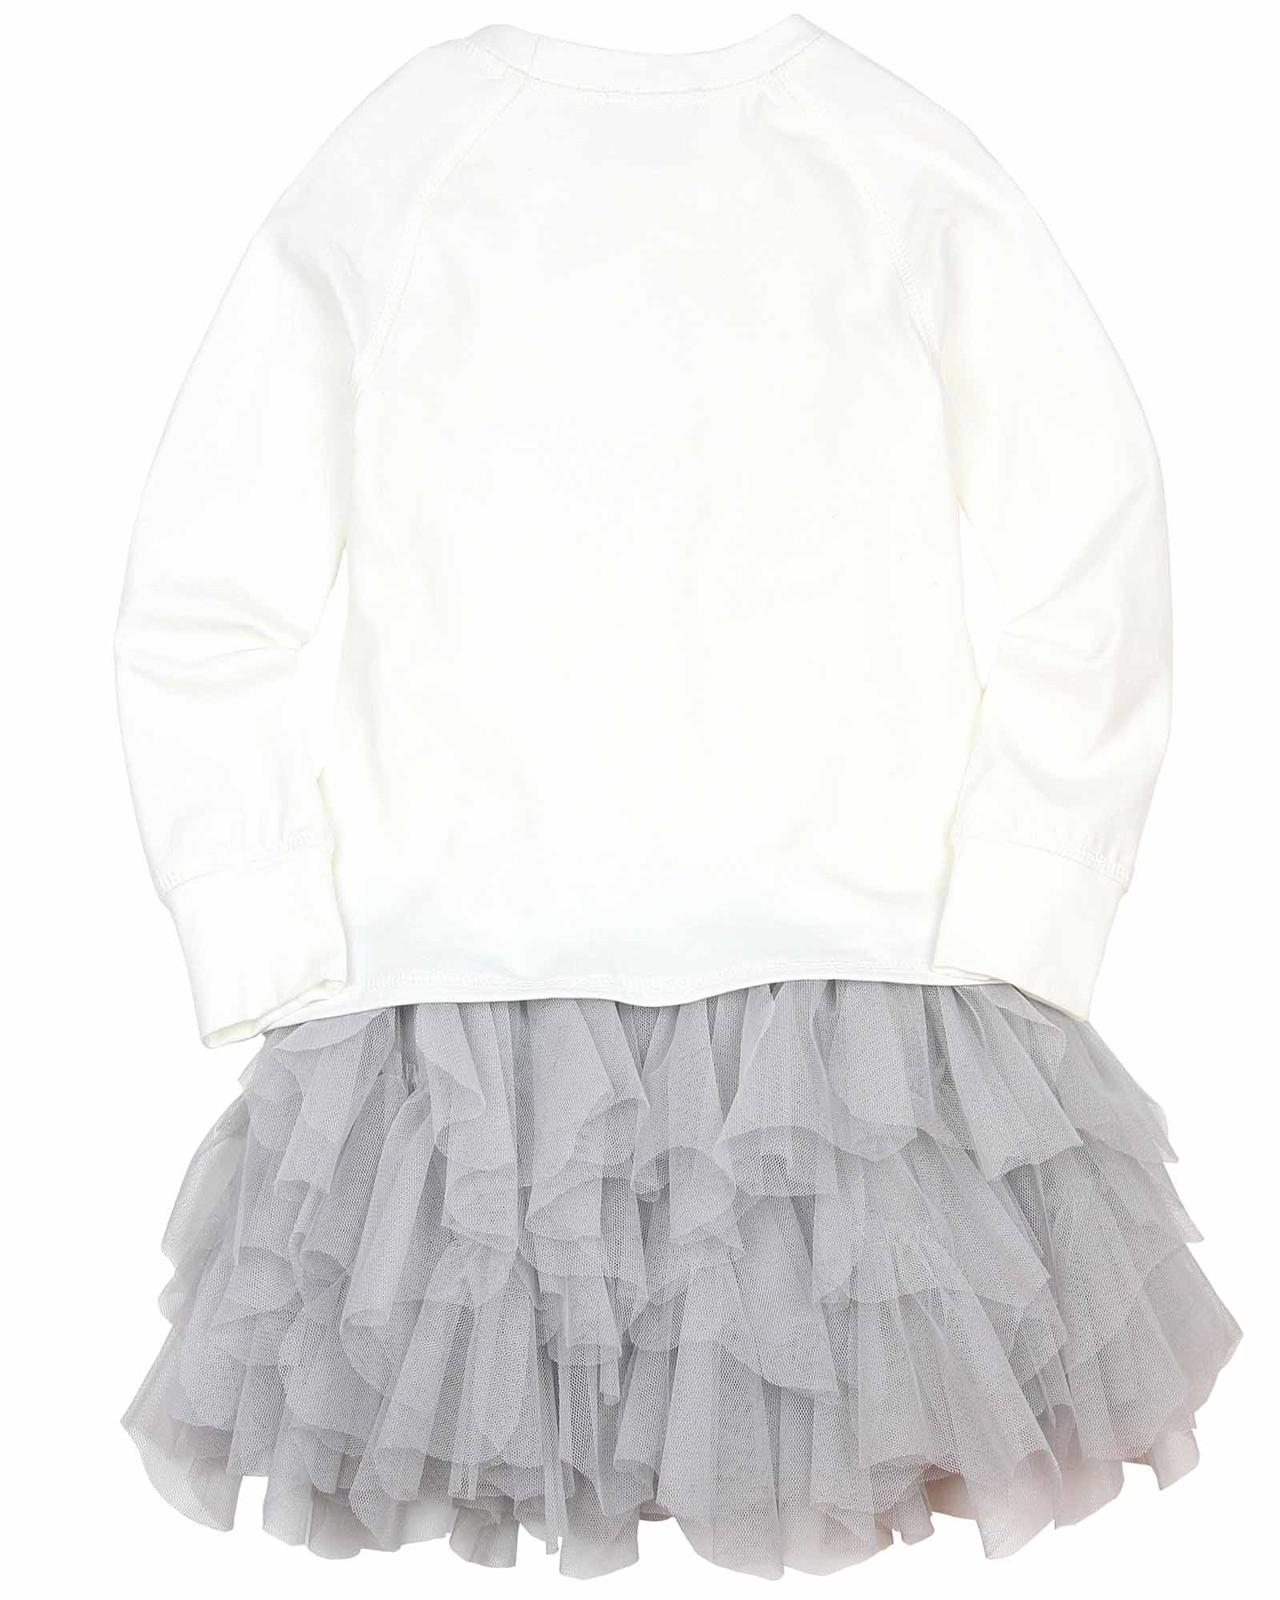 2f7fa33f5 Kate Mack Unicorn Dreams Two-in-one Look Dress | Biscotti and Kate ...